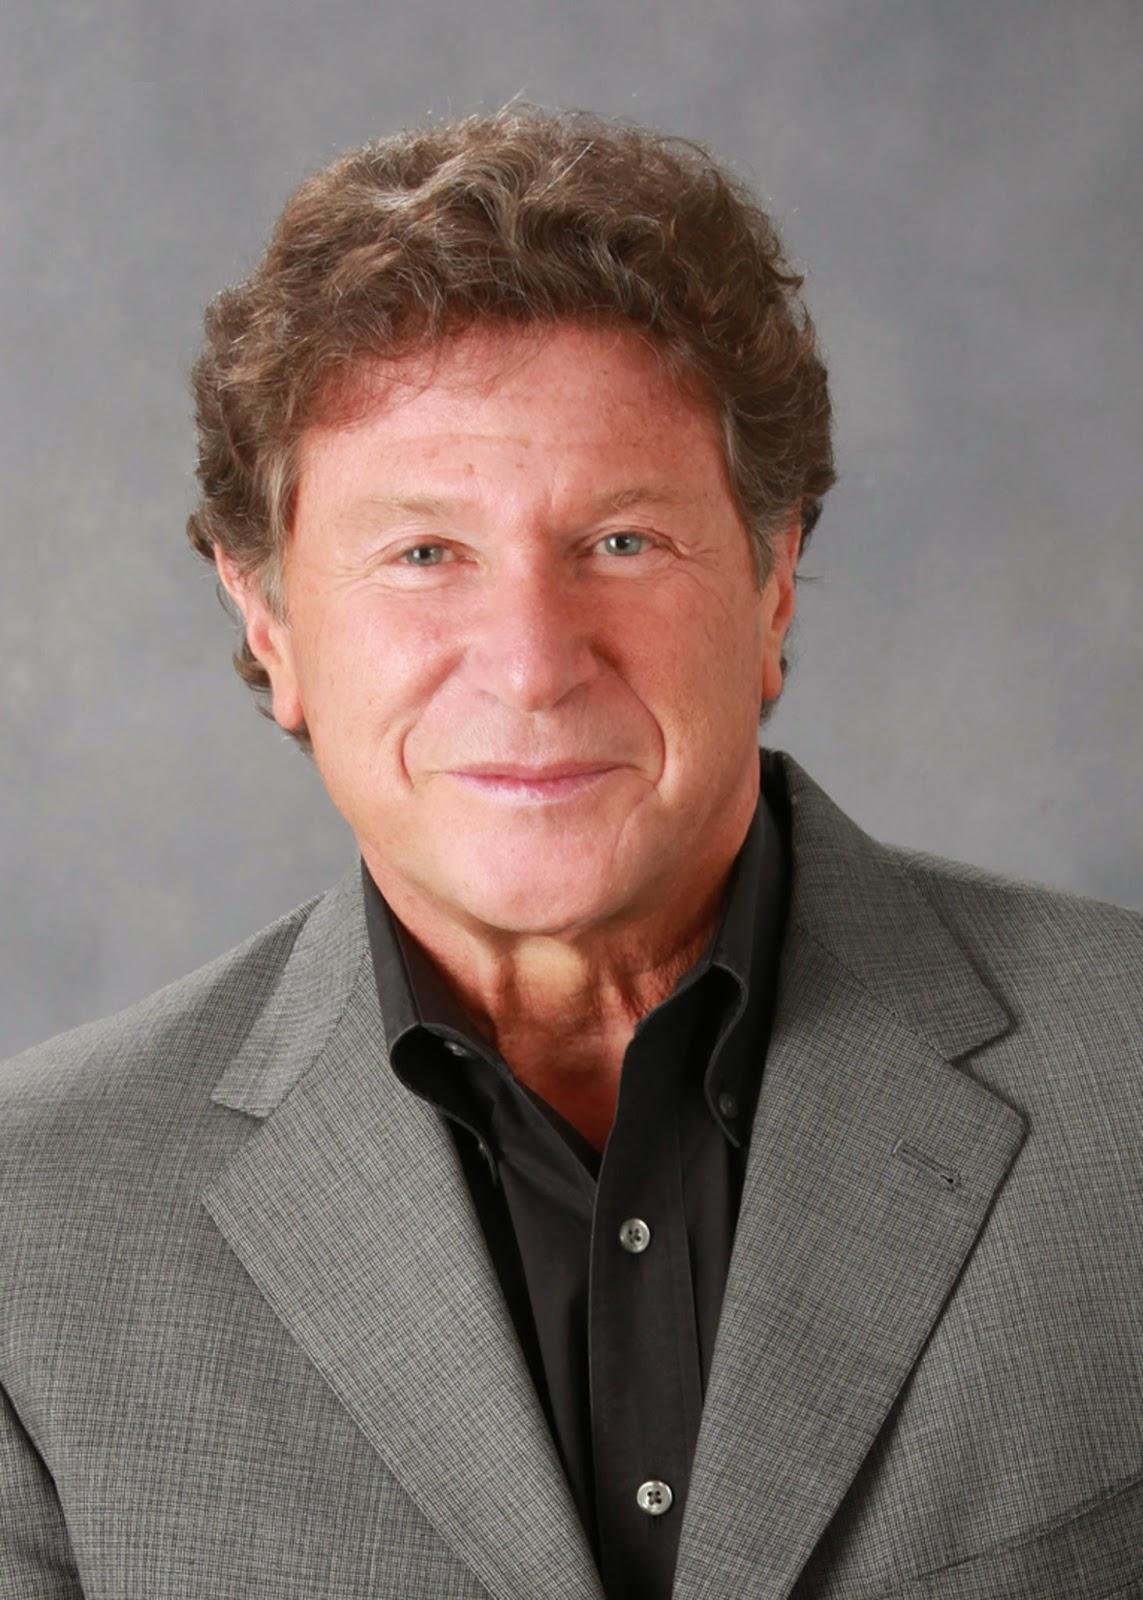 Dr. Ken Dychtwald, Agewave